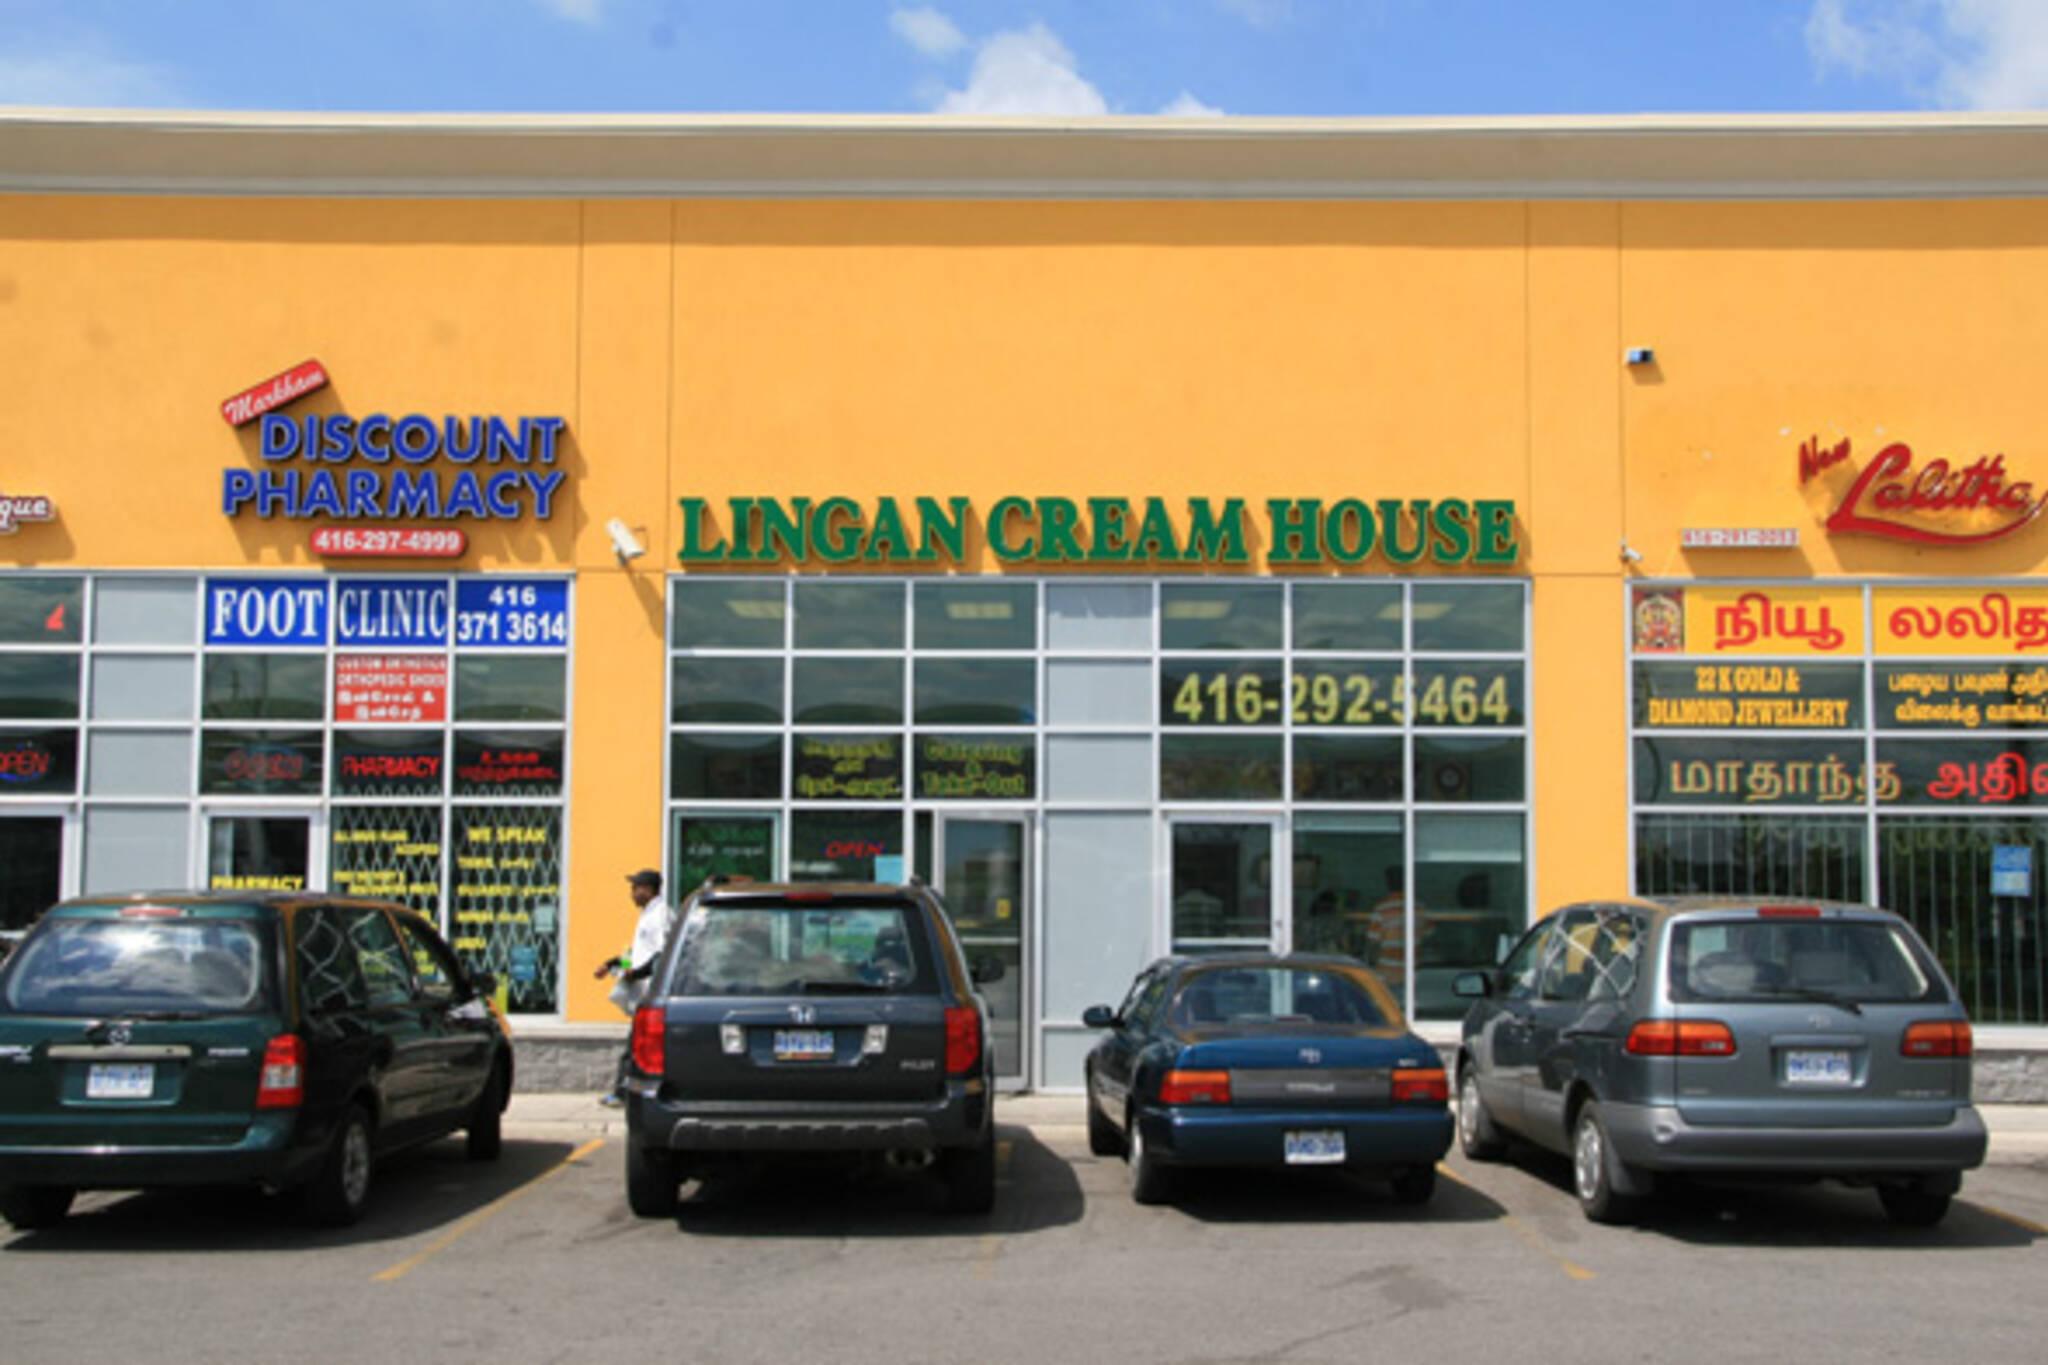 Lingan Cream House